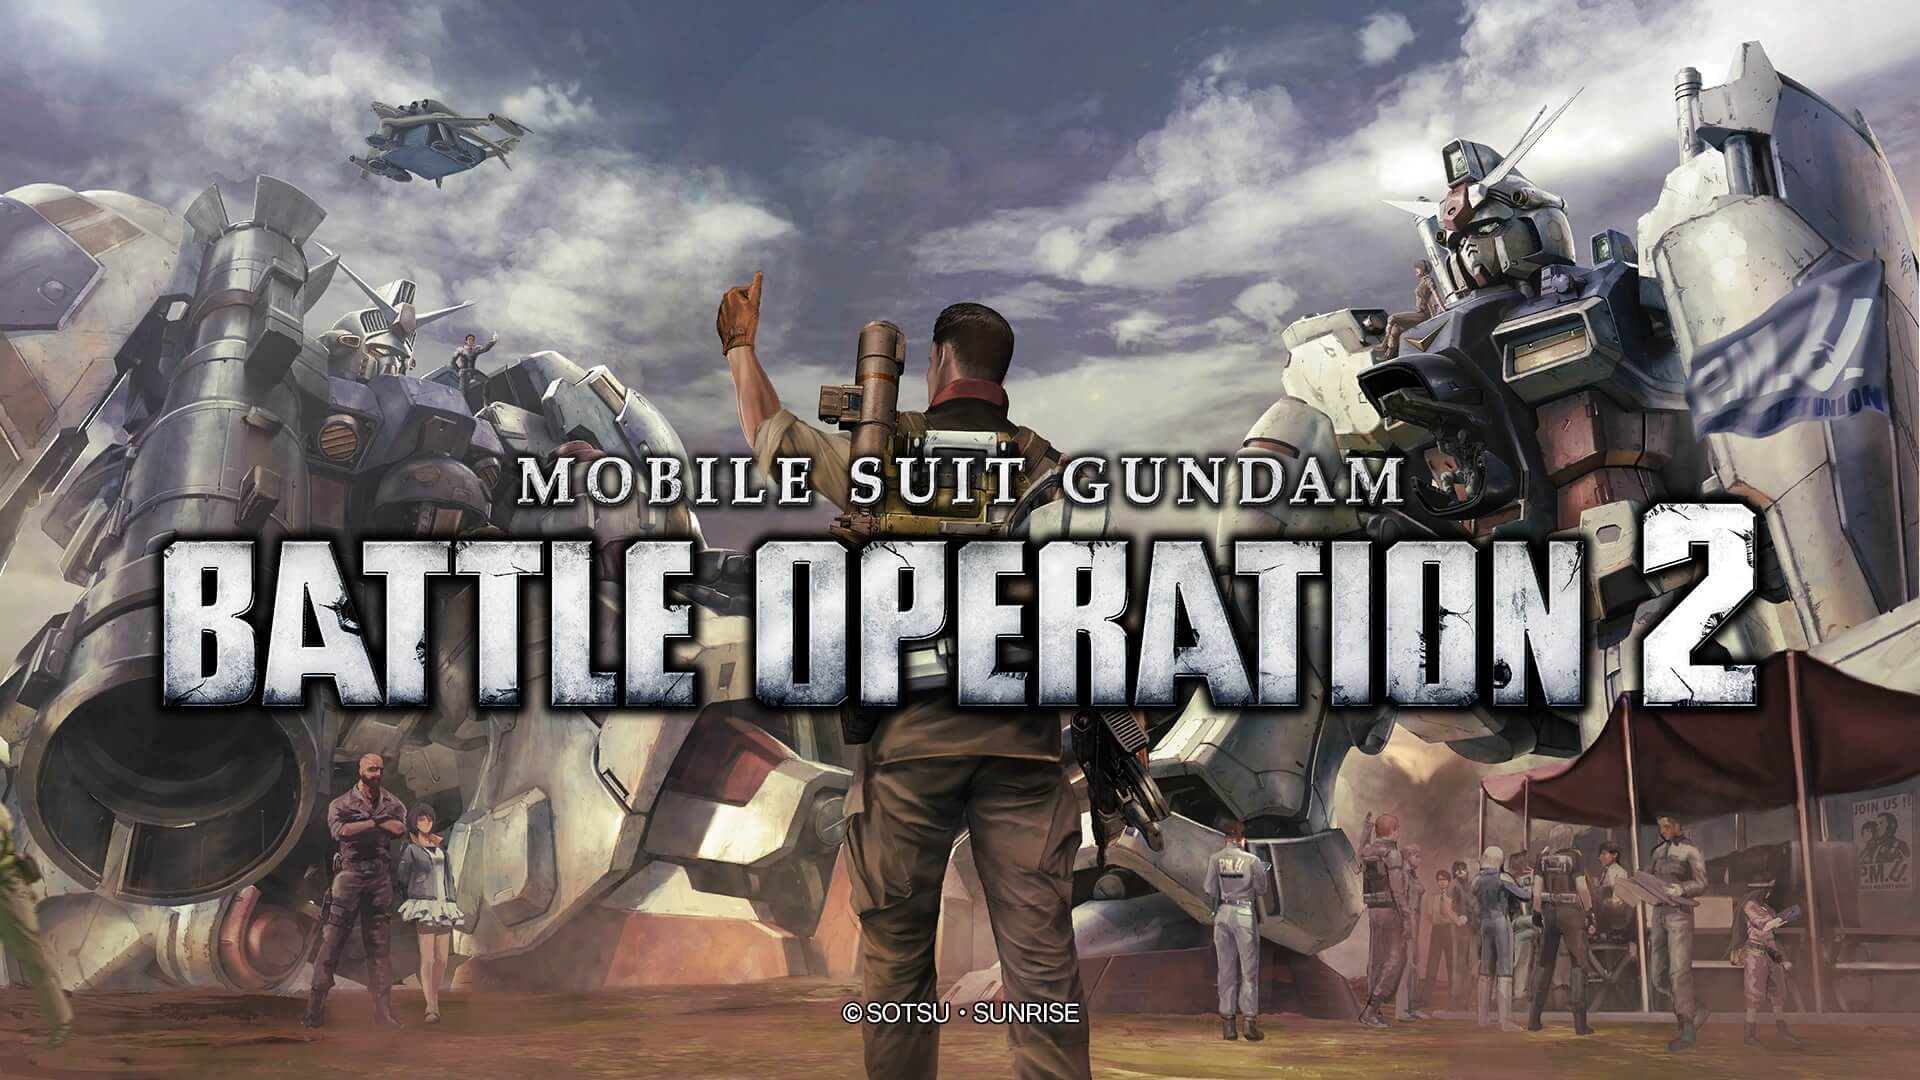 Mobile Suit Gundam: Battle Operation 2 Free PC Download